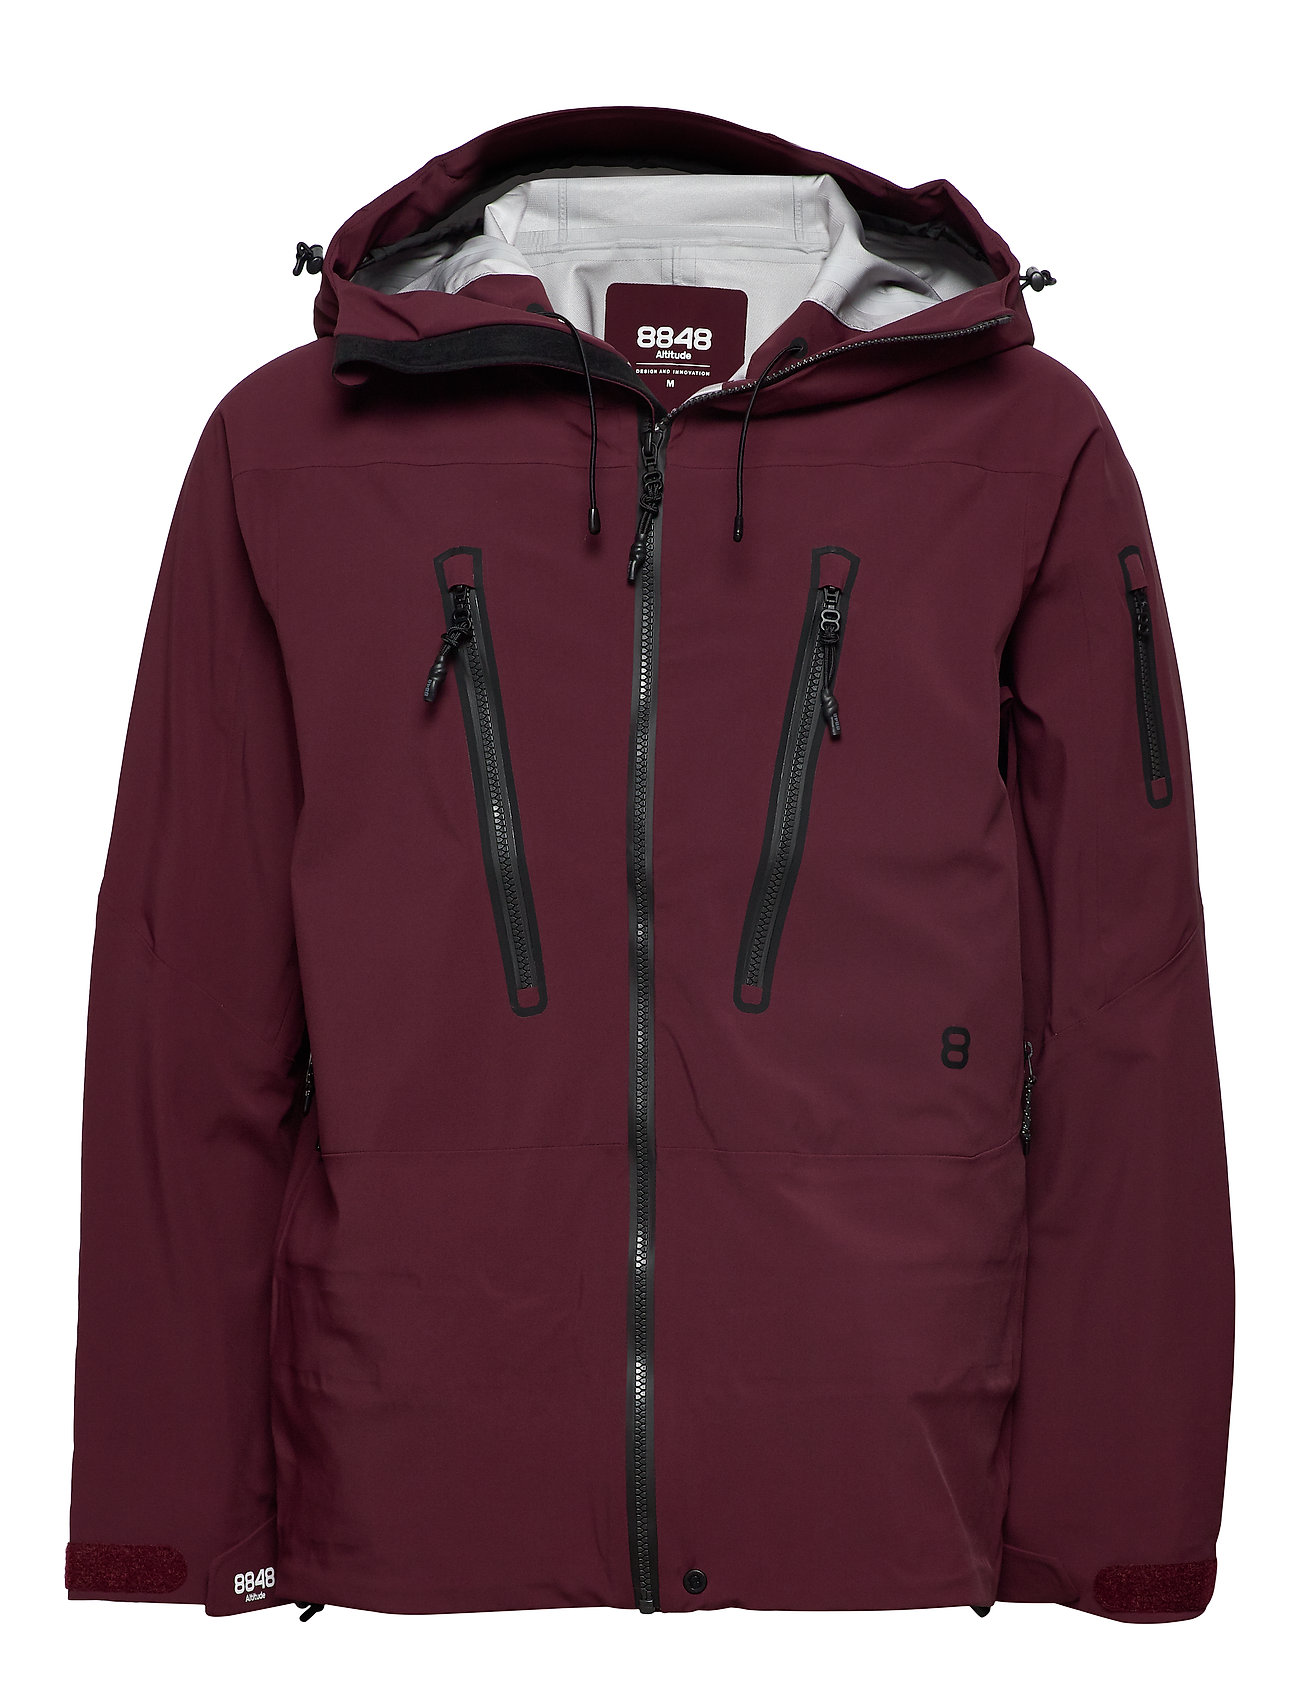 8848 Altitude Gansu Jacket - AMARONE